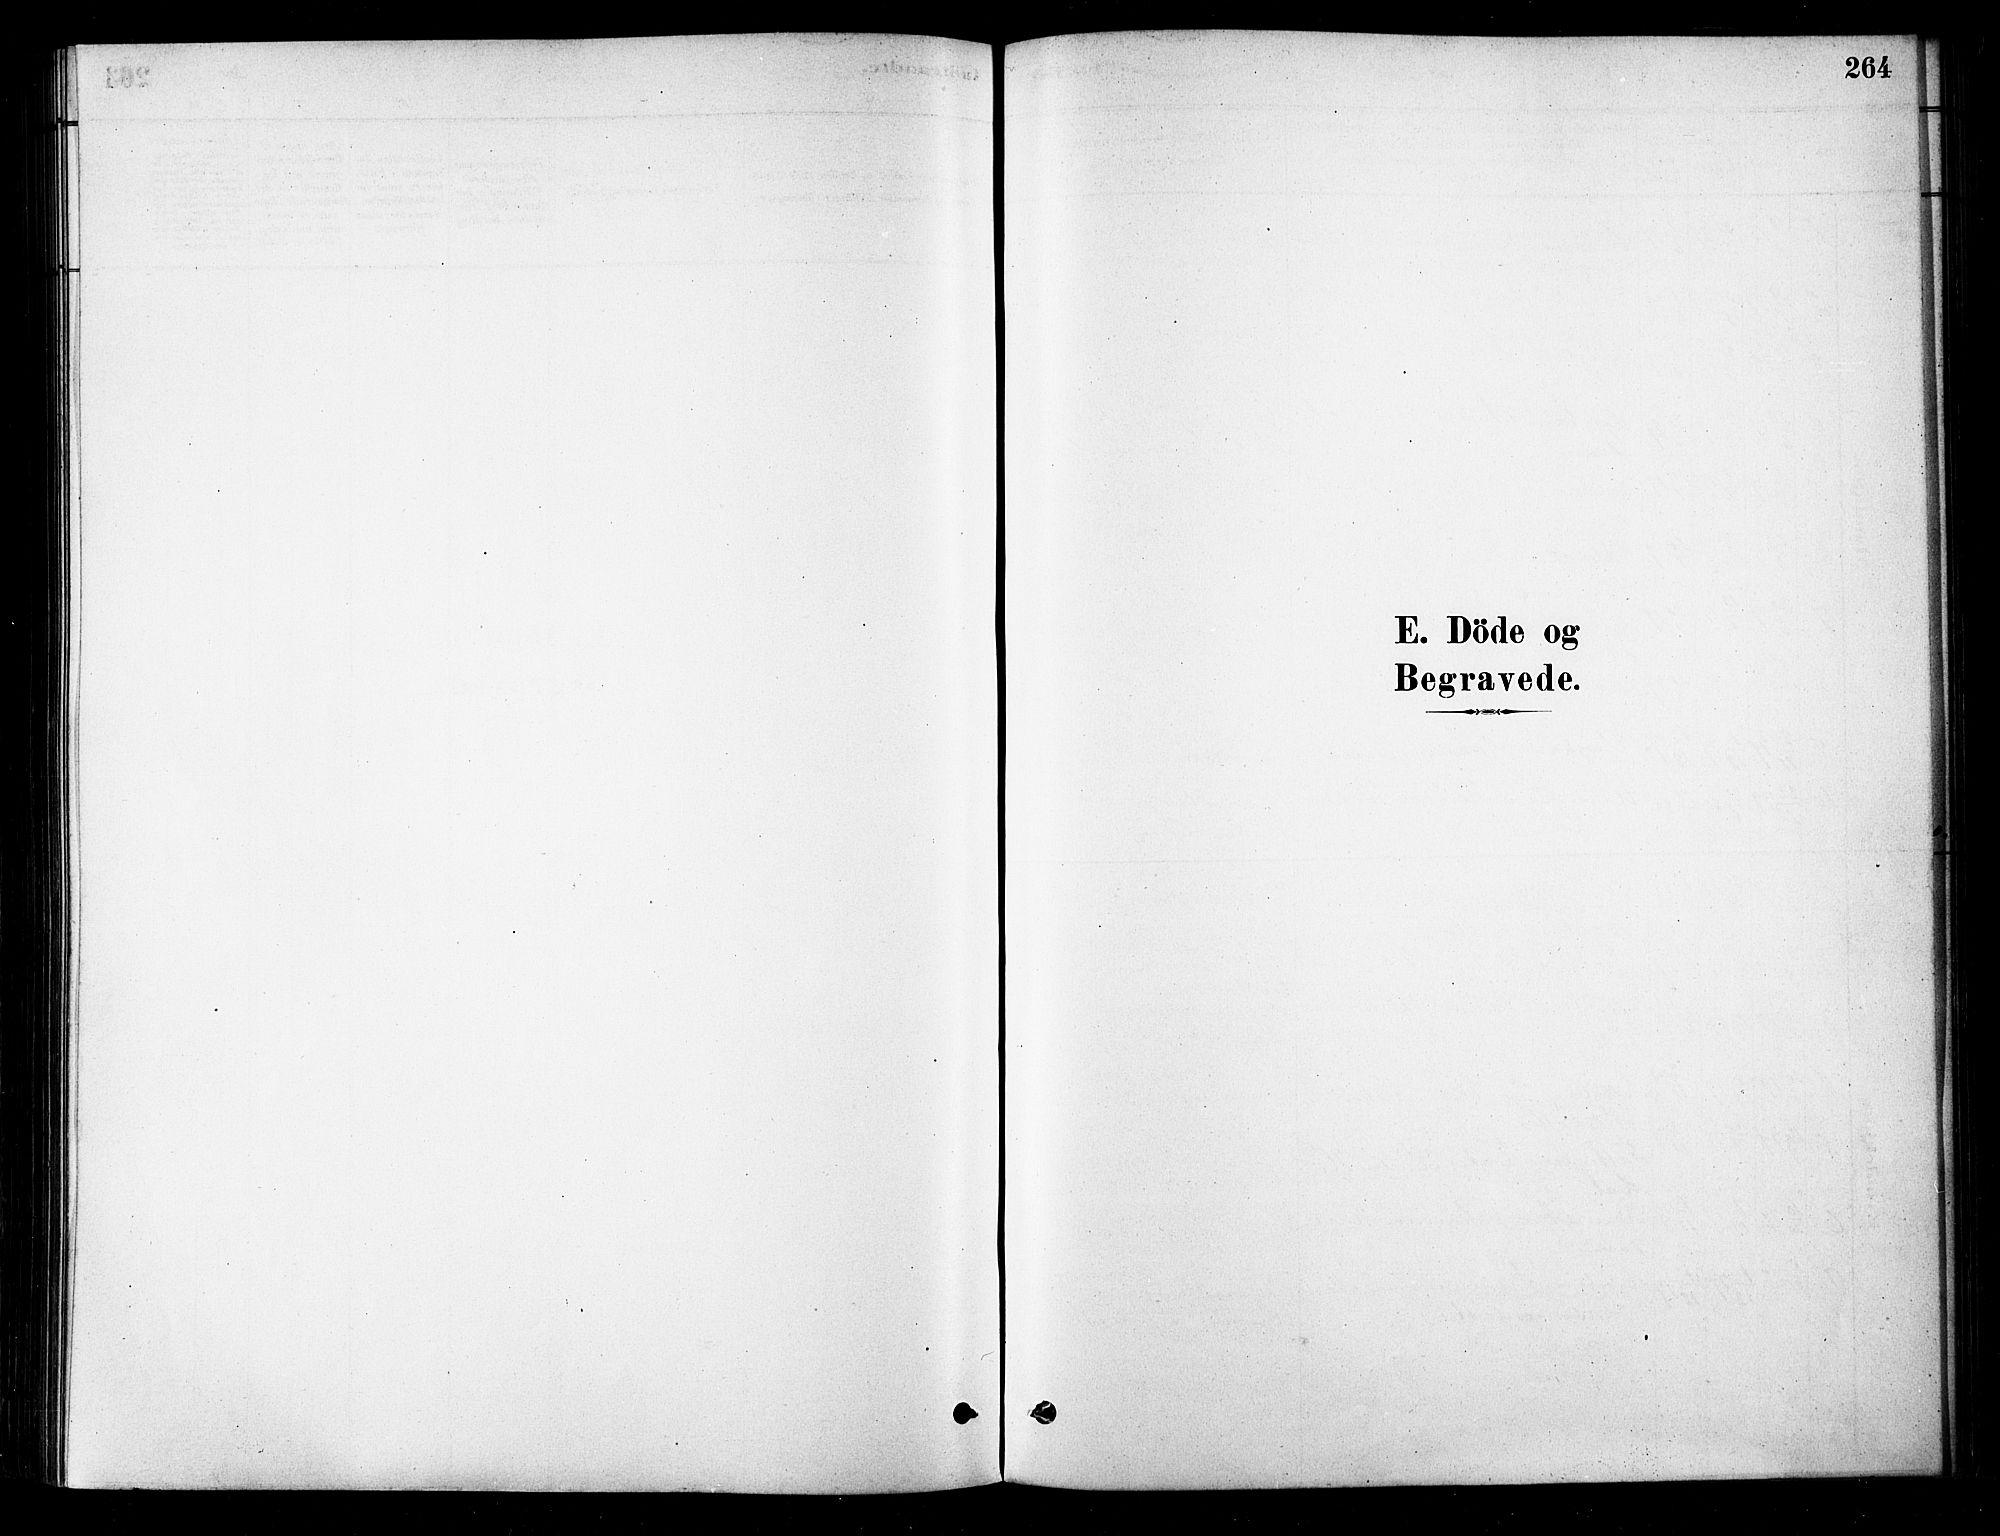 SATØ, Karlsøy sokneprestembete, H/Ha/Haa/L0006kirke: Parish register (official) no. 6, 1879-1890, p. 264